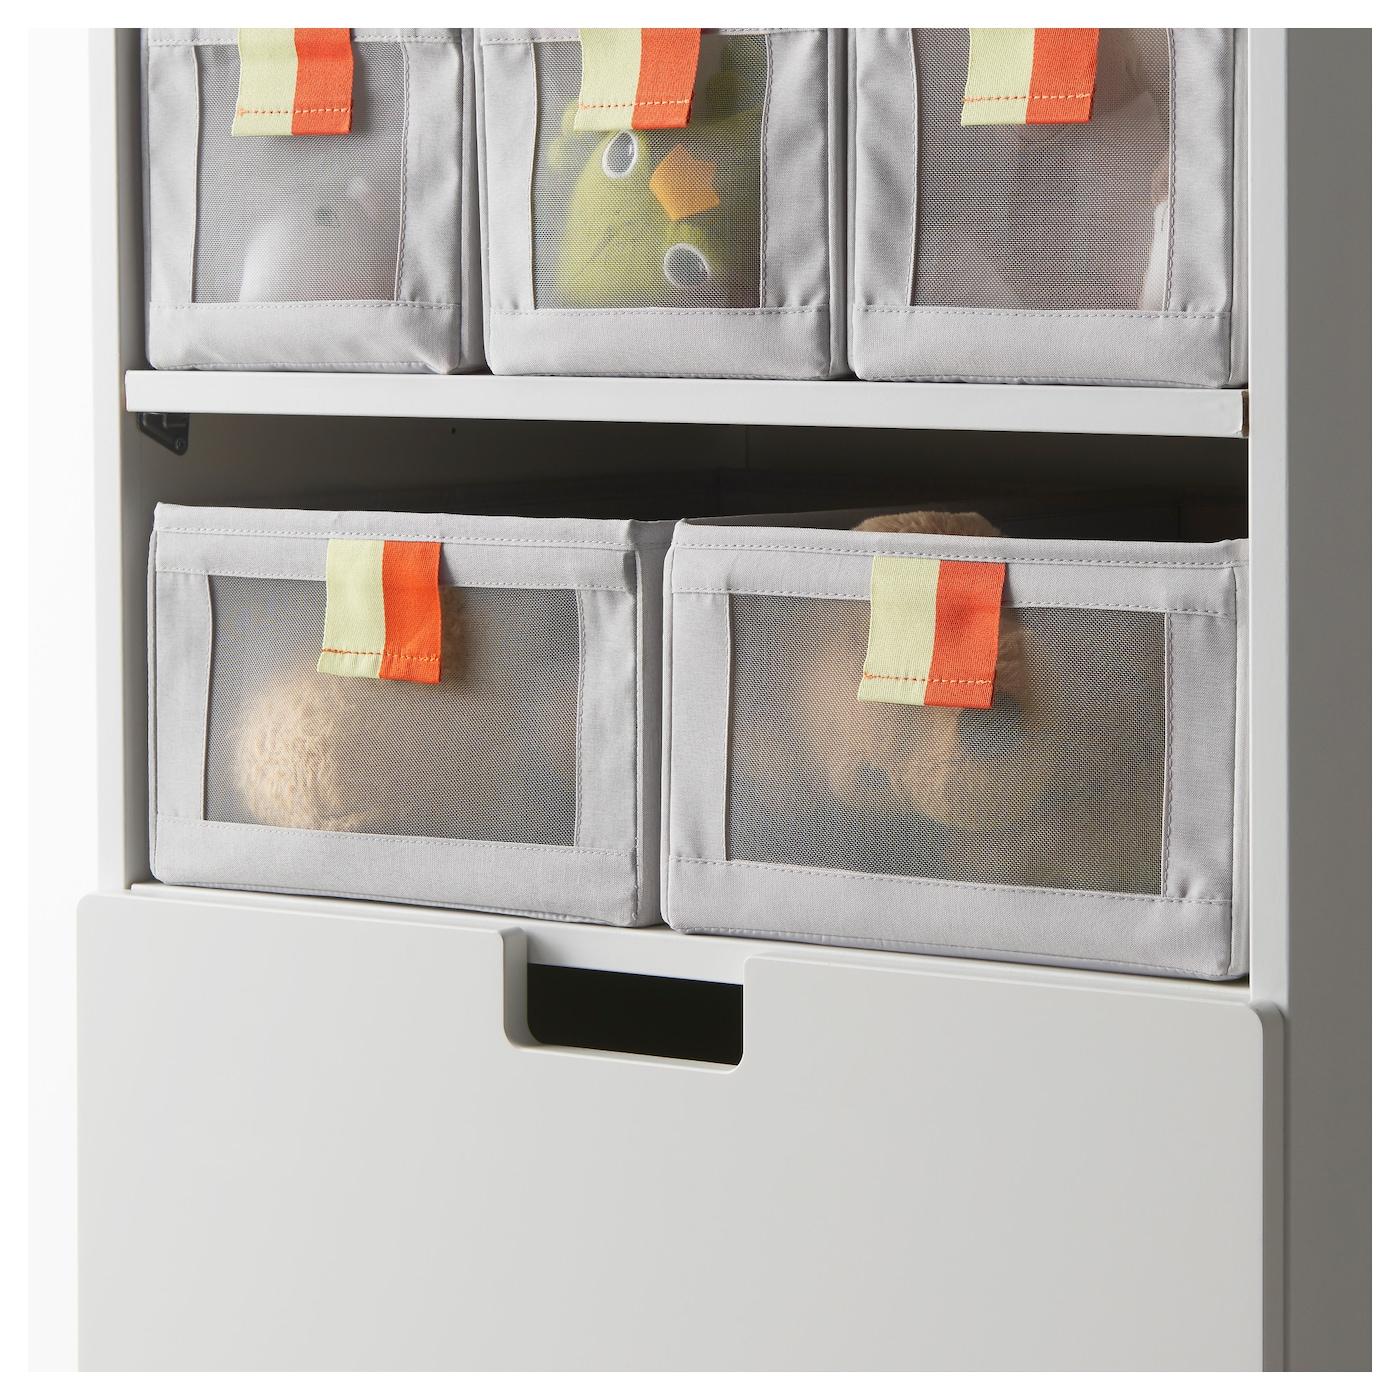 sl kting rangement tissu gris vert 27x42x17 cm ikea. Black Bedroom Furniture Sets. Home Design Ideas